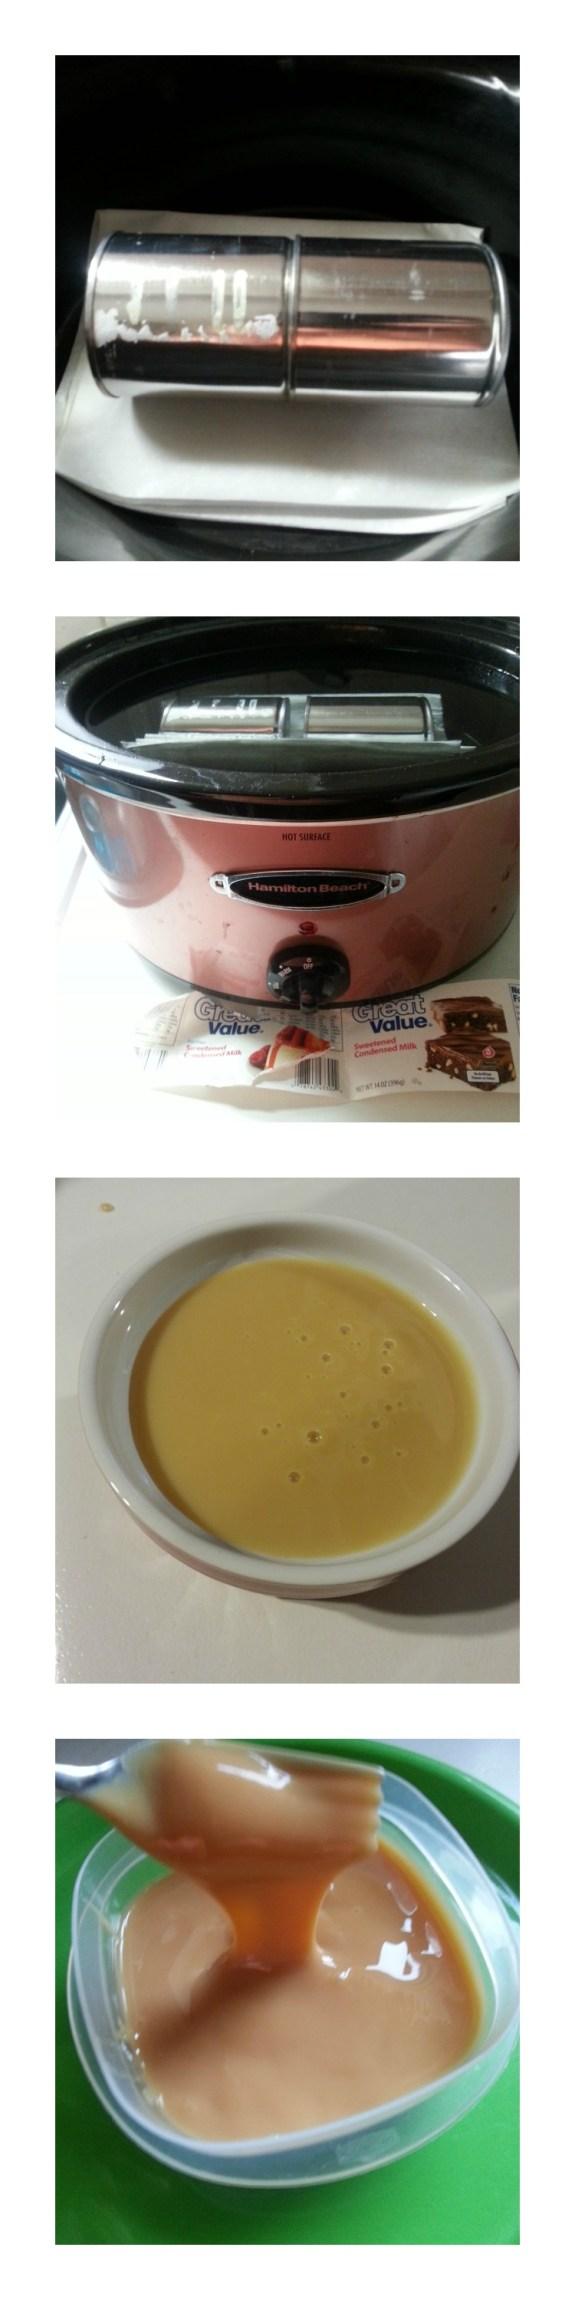 Easy Caramel in Slow Cooker